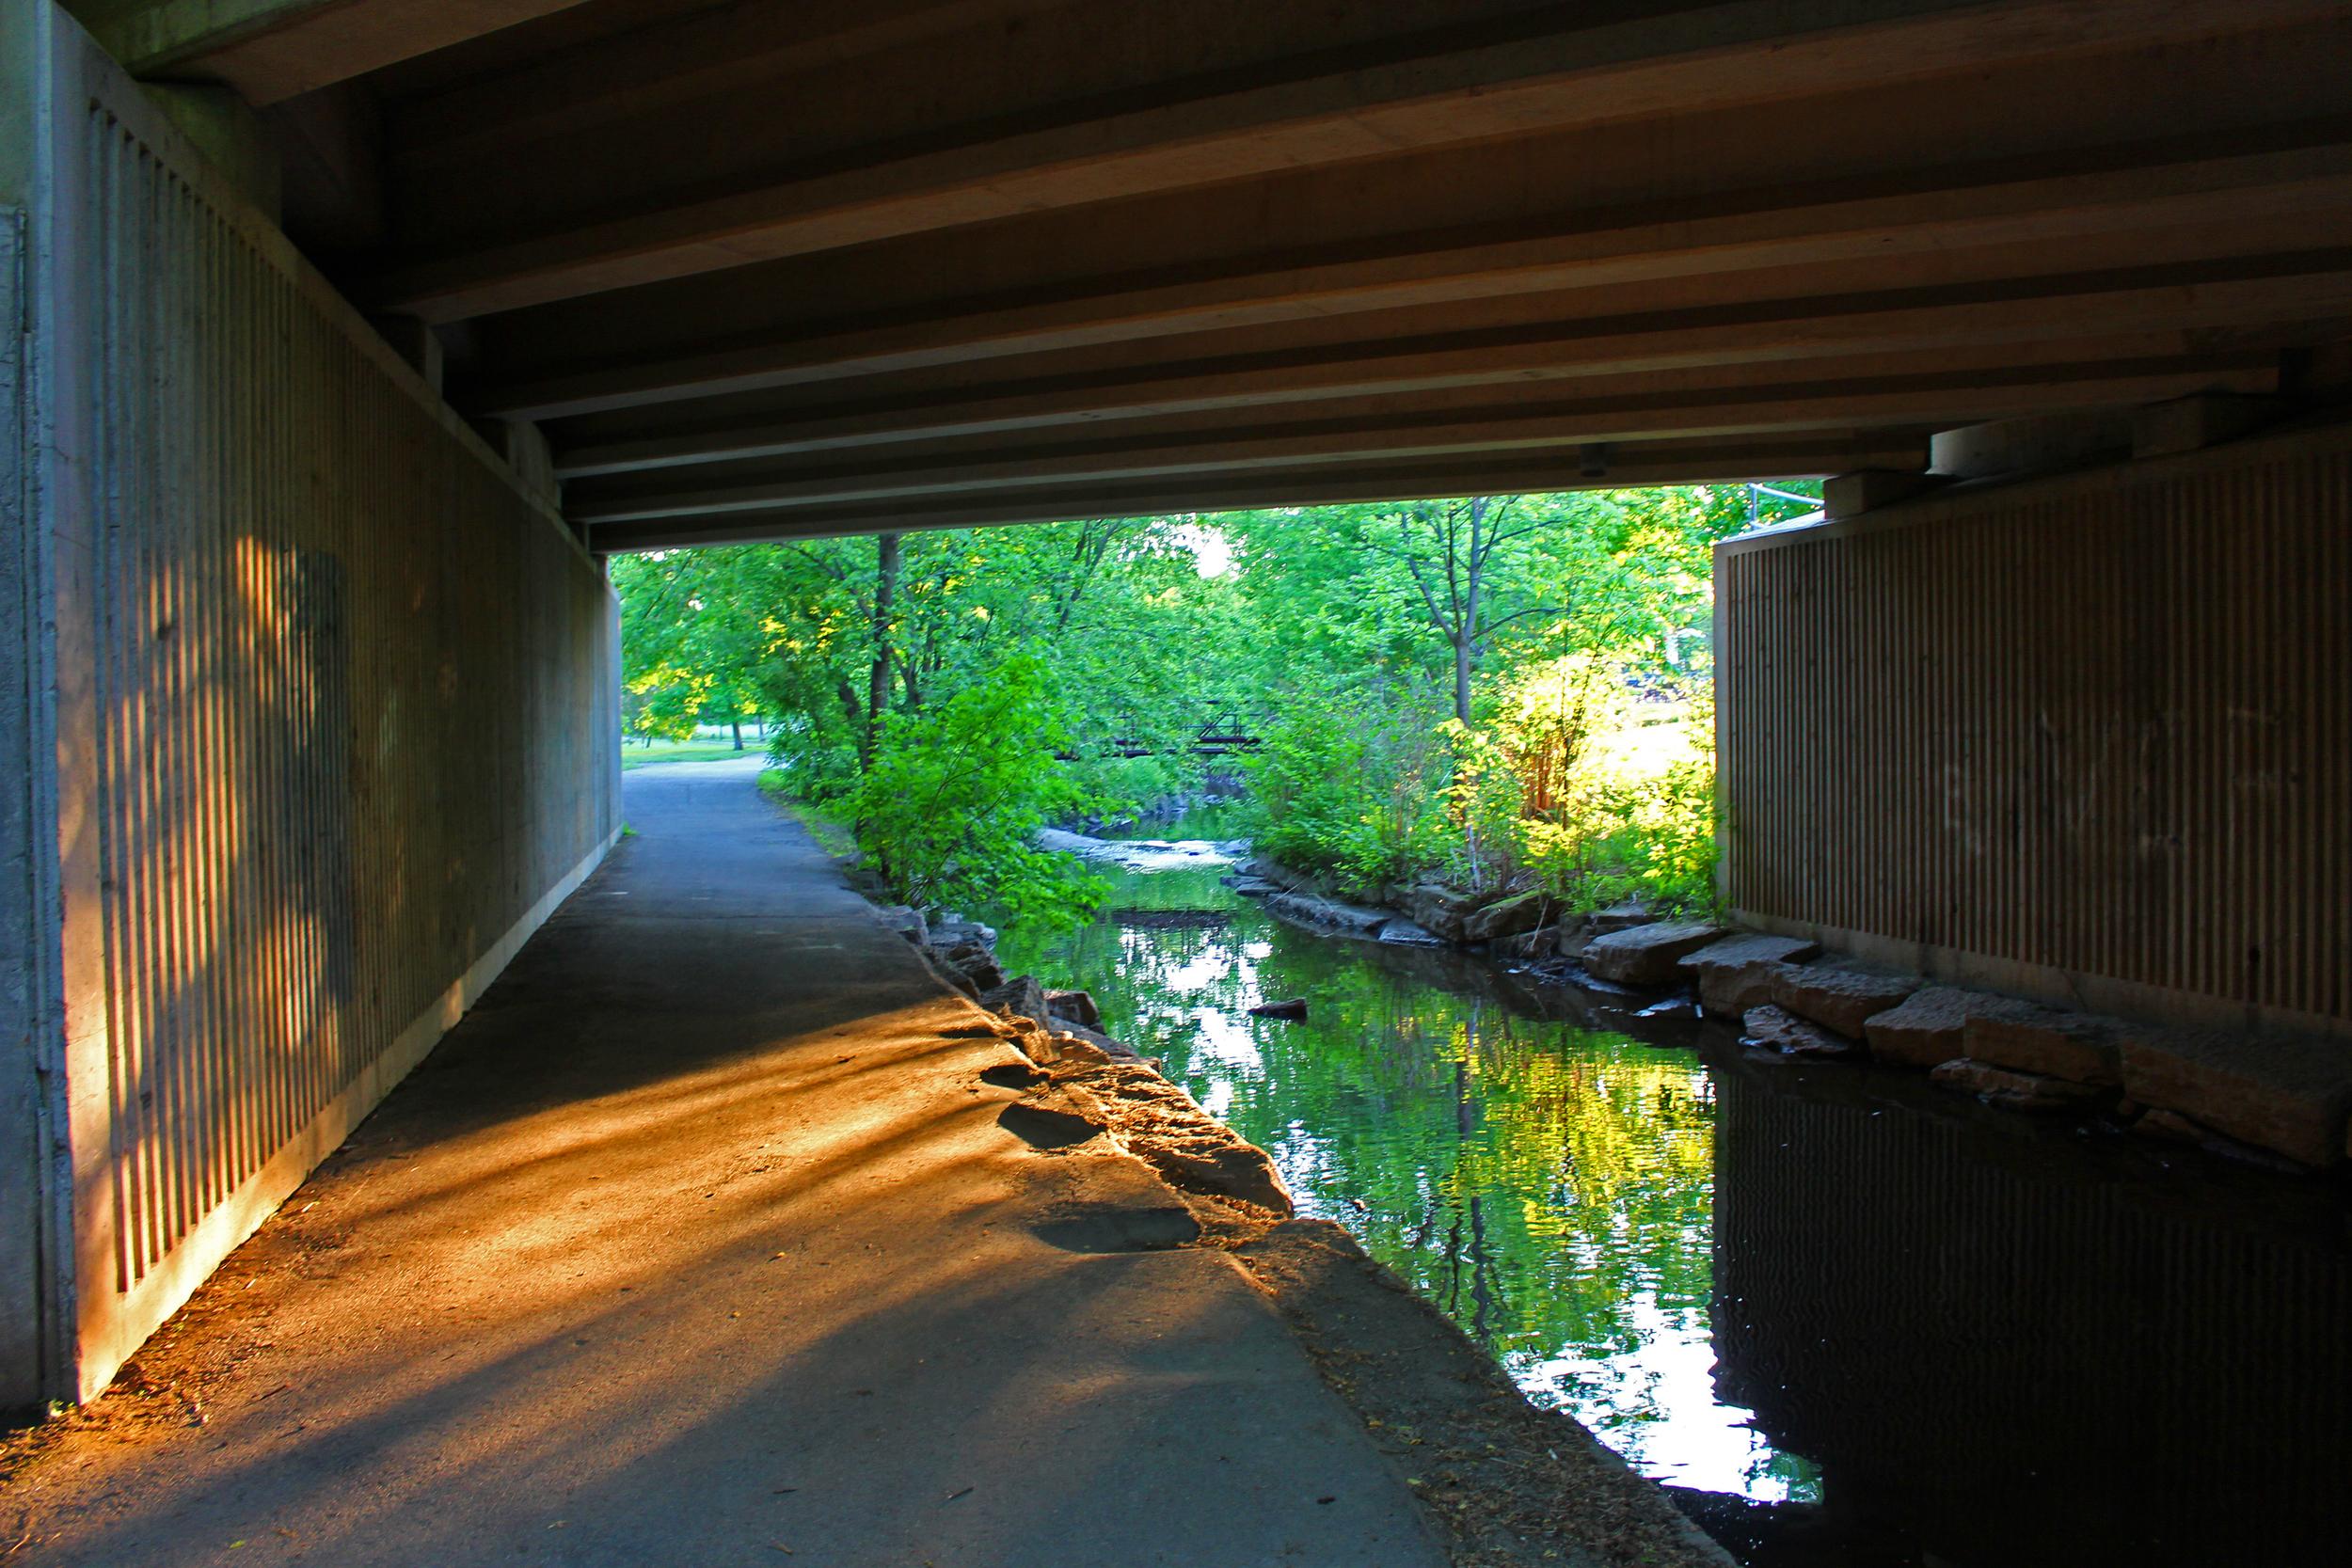 Brock Trail by Steph Dunbar IMG_0248.jpg